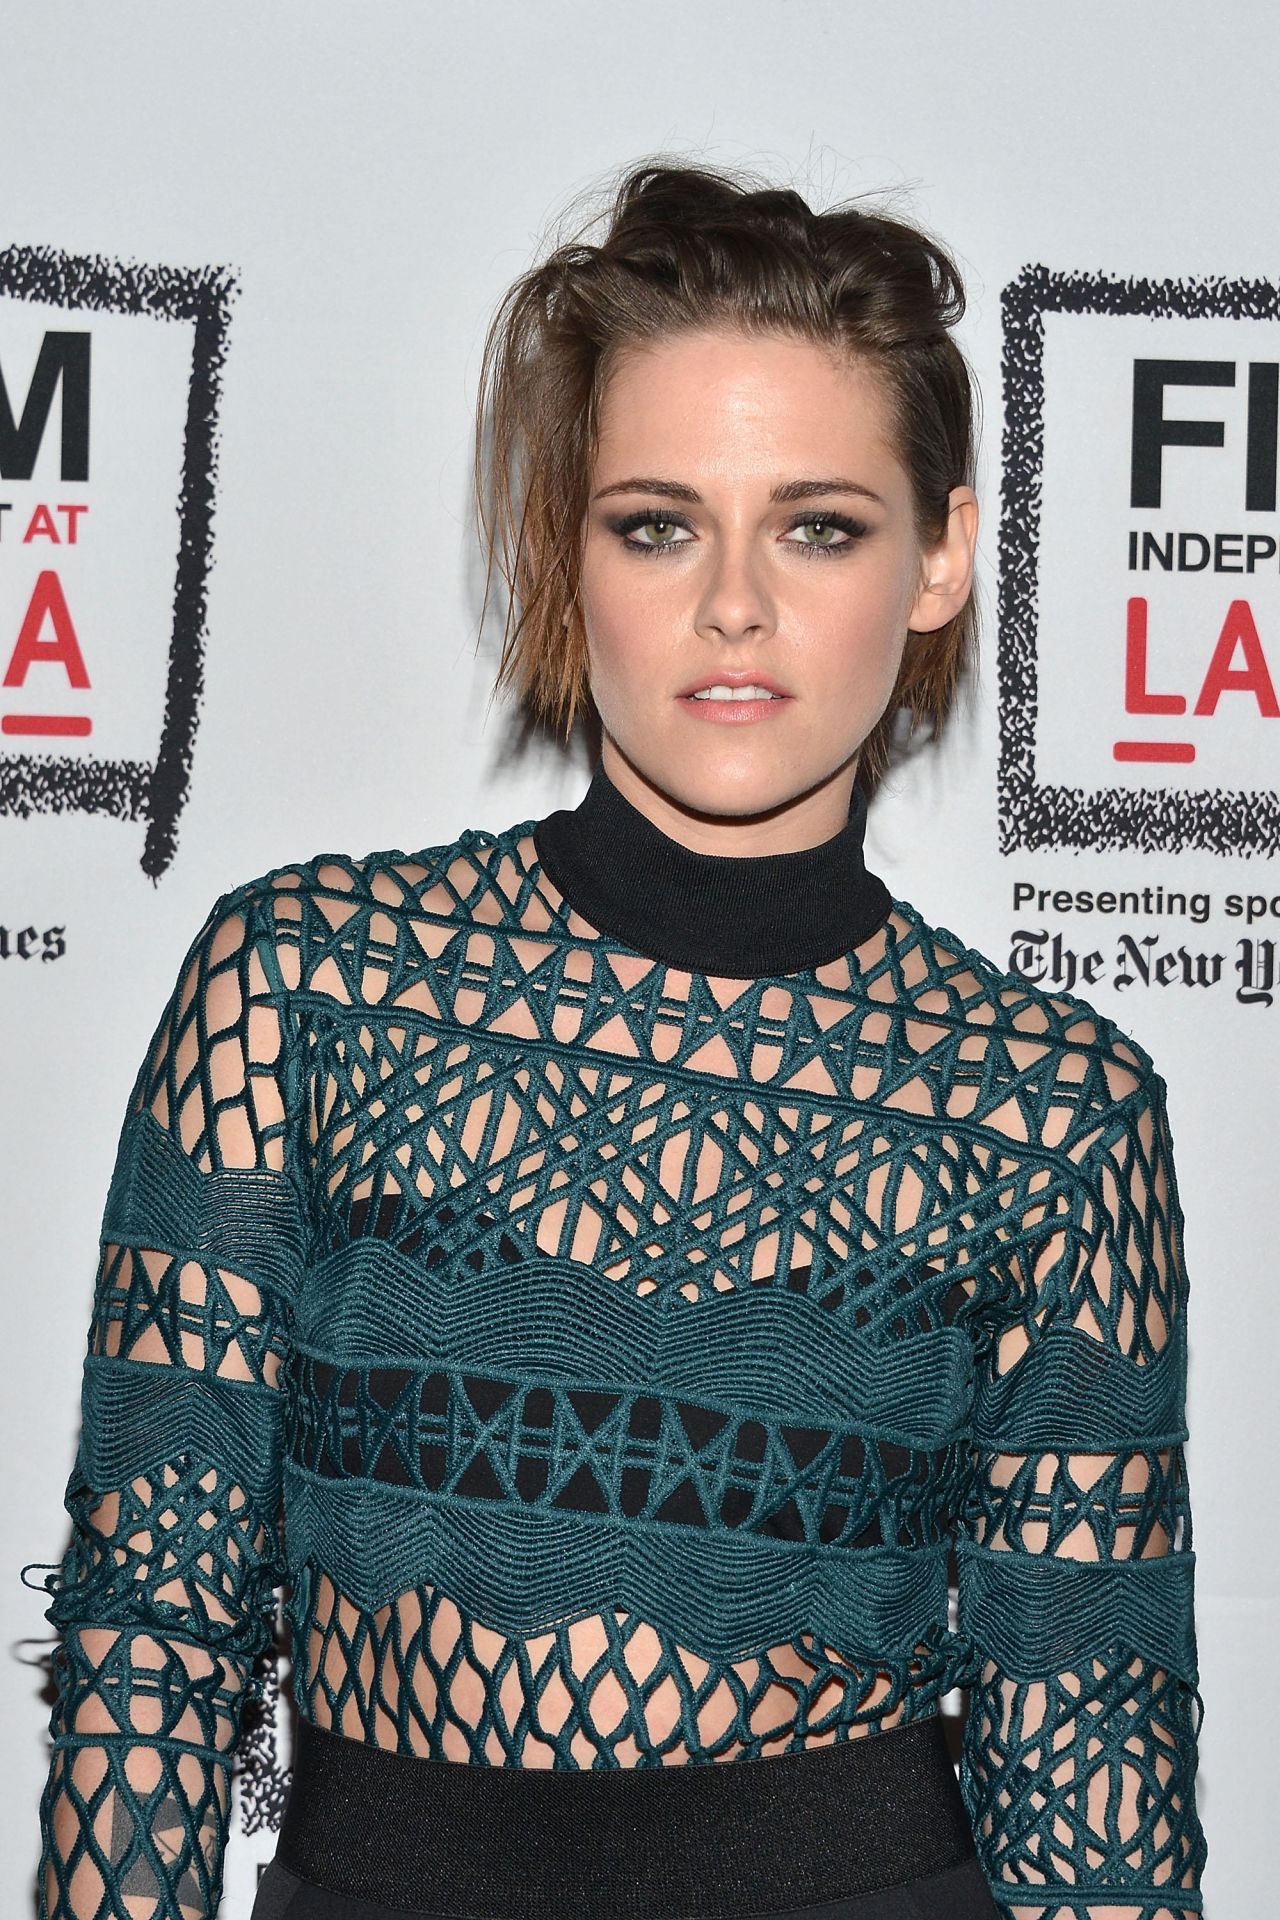 Kristen Stewart - Clouds of Sils Maria Screening, LACMA, Los Angeles